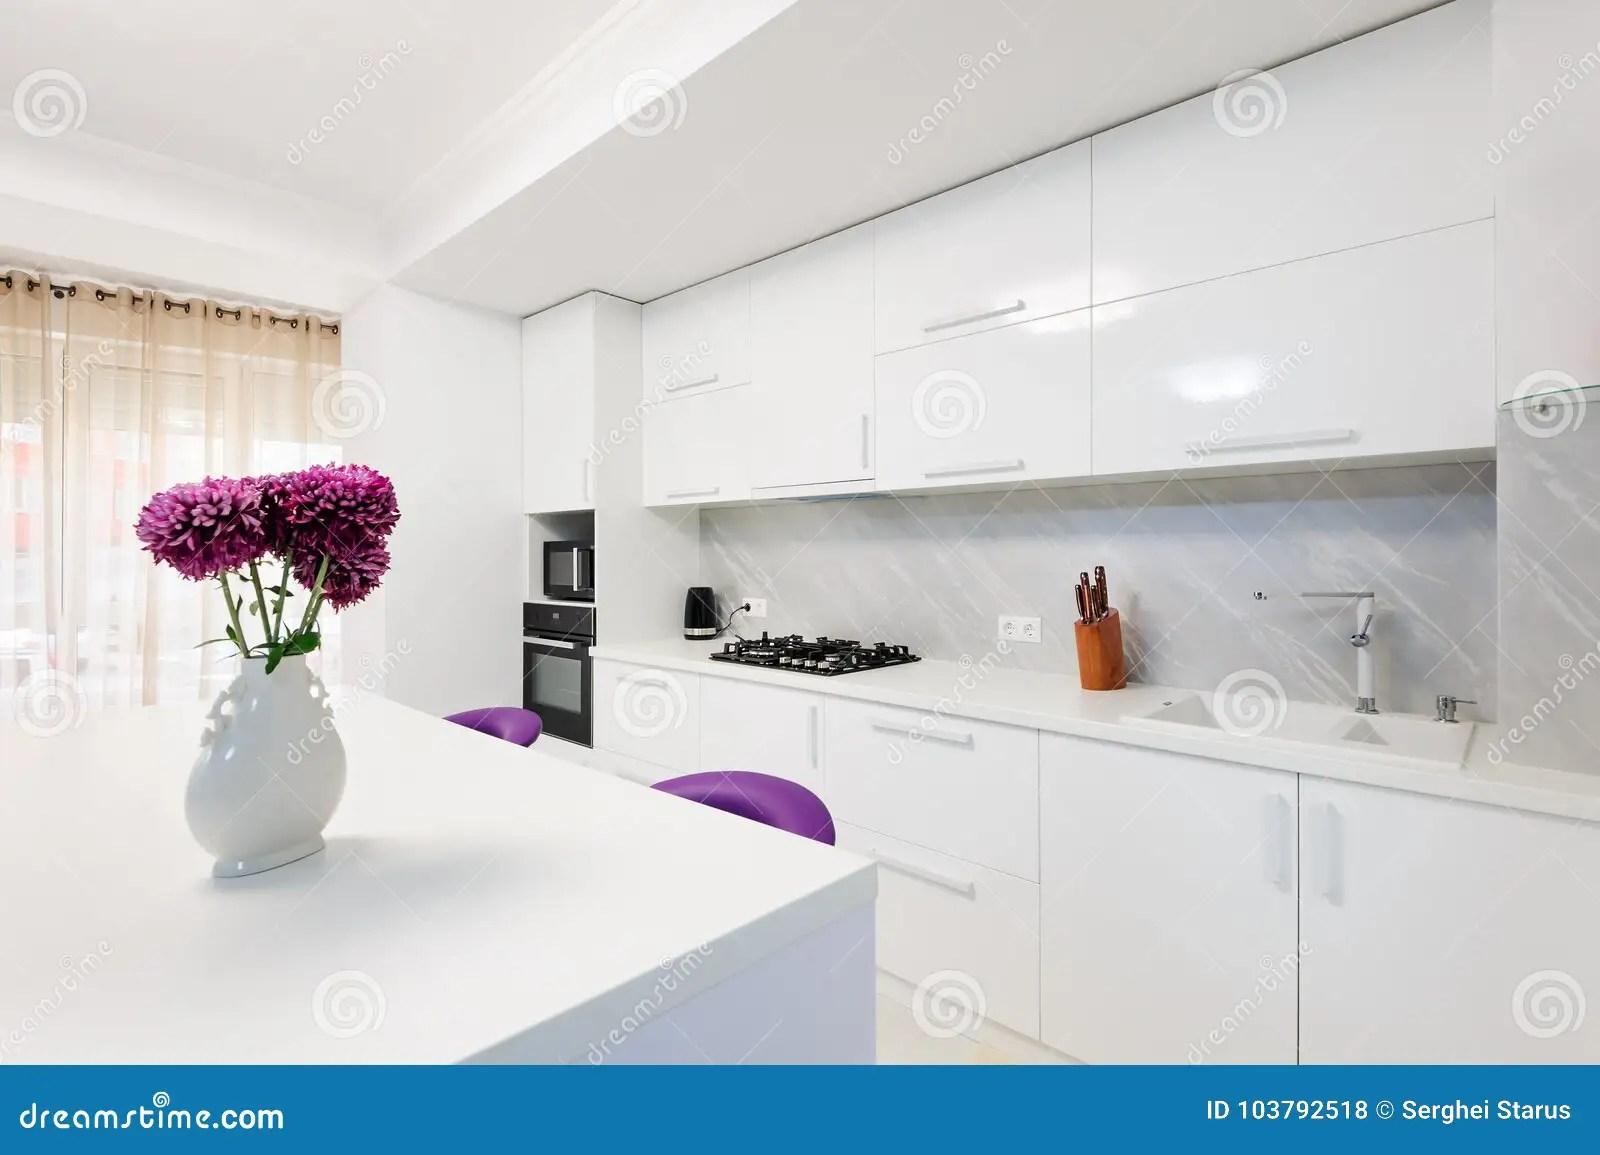 modern kitchen stools epoxy commercial flooring 有餐桌和紫色椅子的现代厨房库存照片 图片包括有居住 凳子 花瓶 照亮 与紫色酒吧椅子的现代白色厨房内部 minimalistic清洗设计